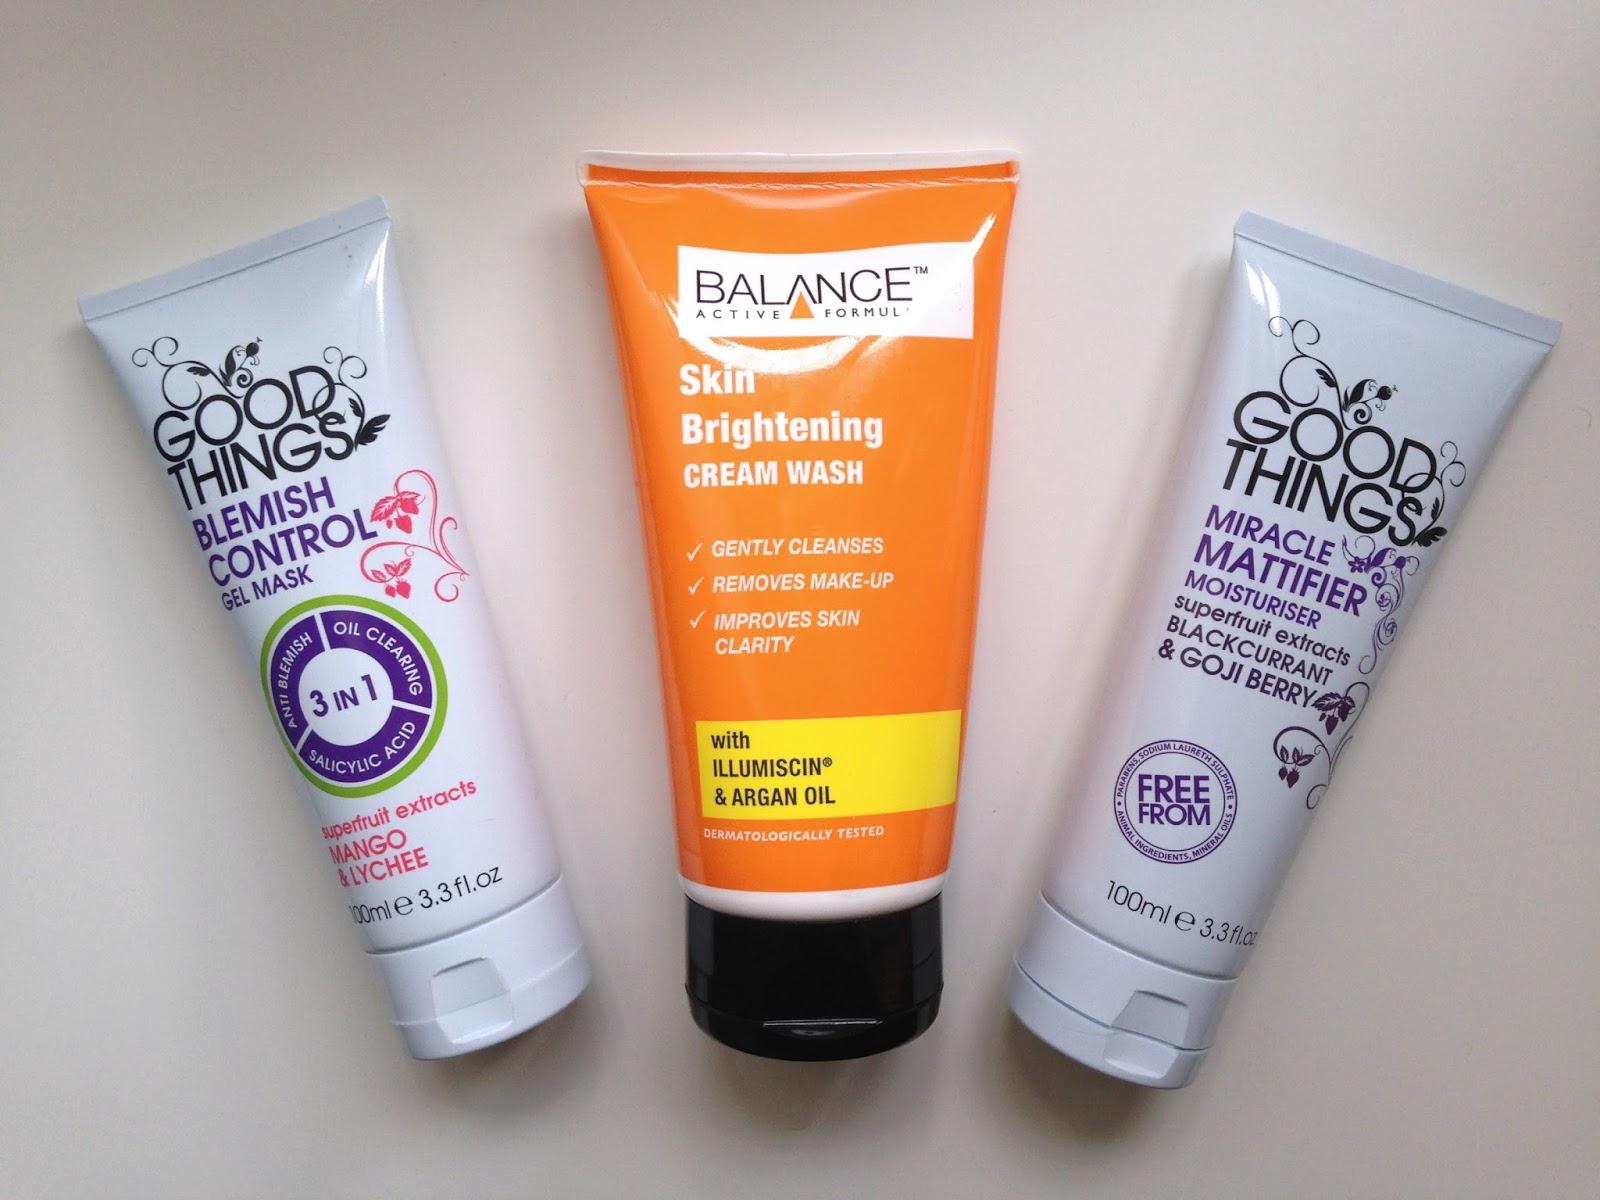 Good things Blemish Control Mask Good things Mattifying moisturiser Balance Active Skincare Brightening Face Wash